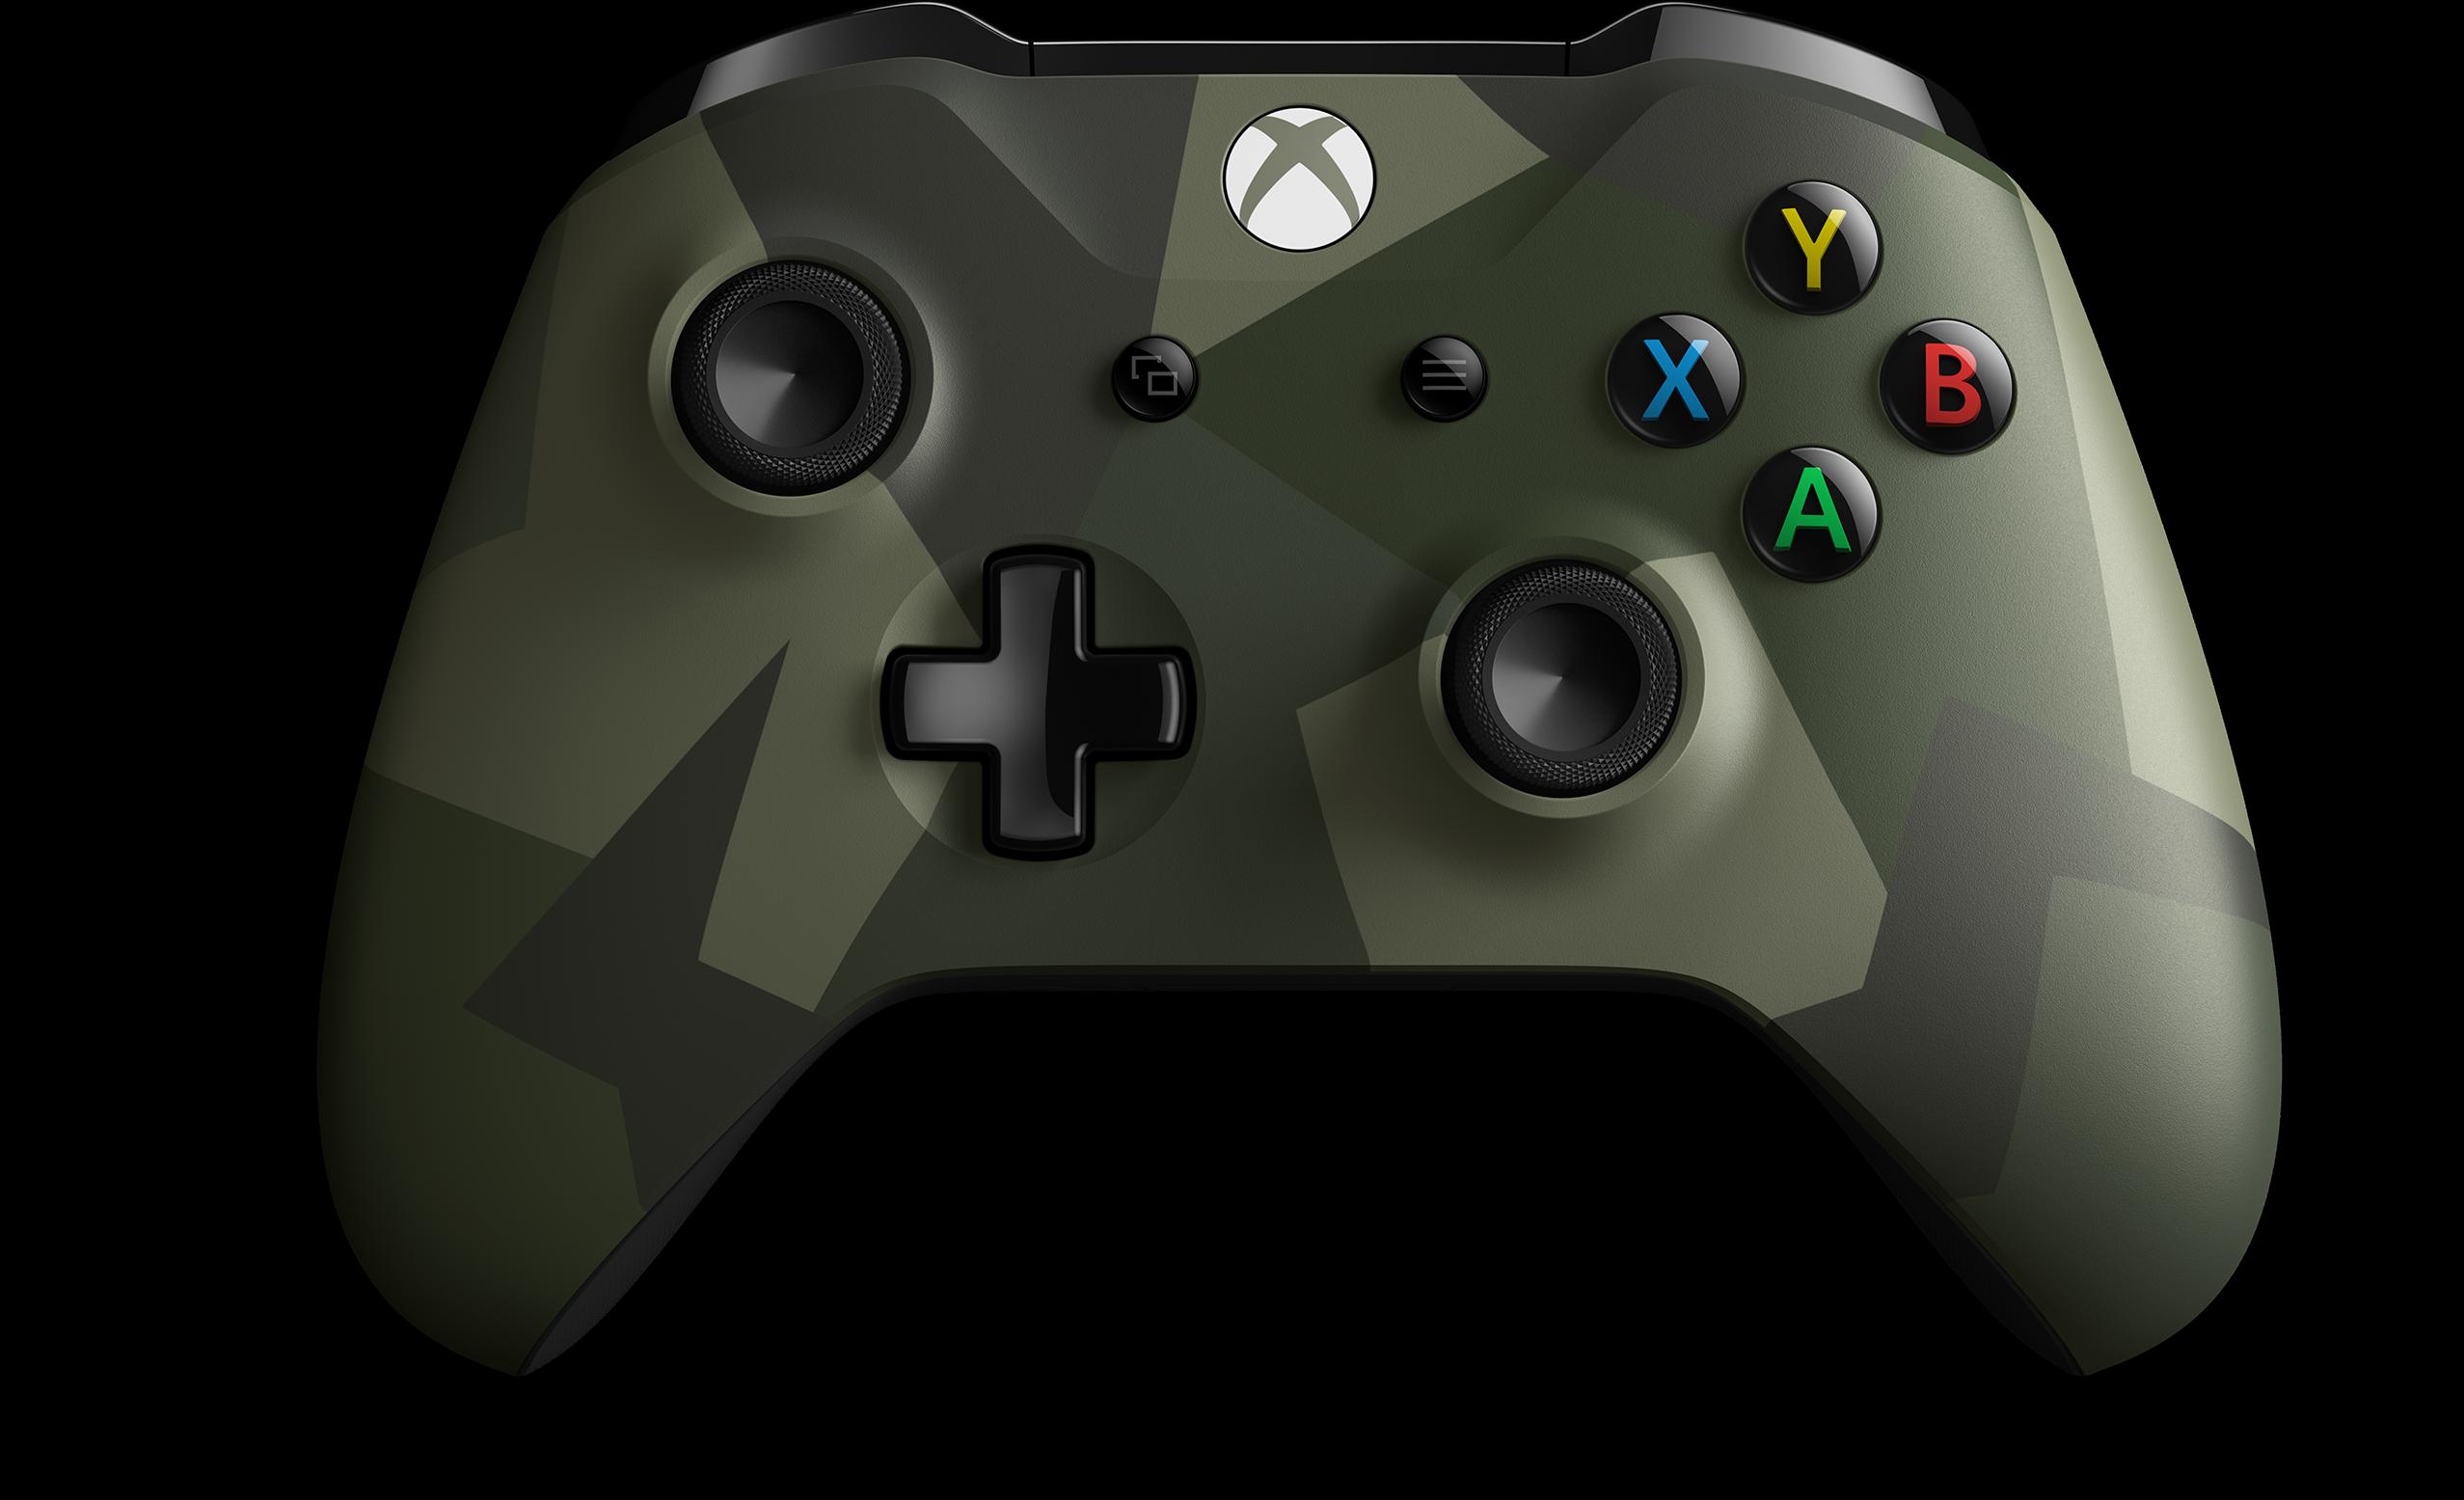 Mando inalámbrico Xbox Armed Forces II Special Edition